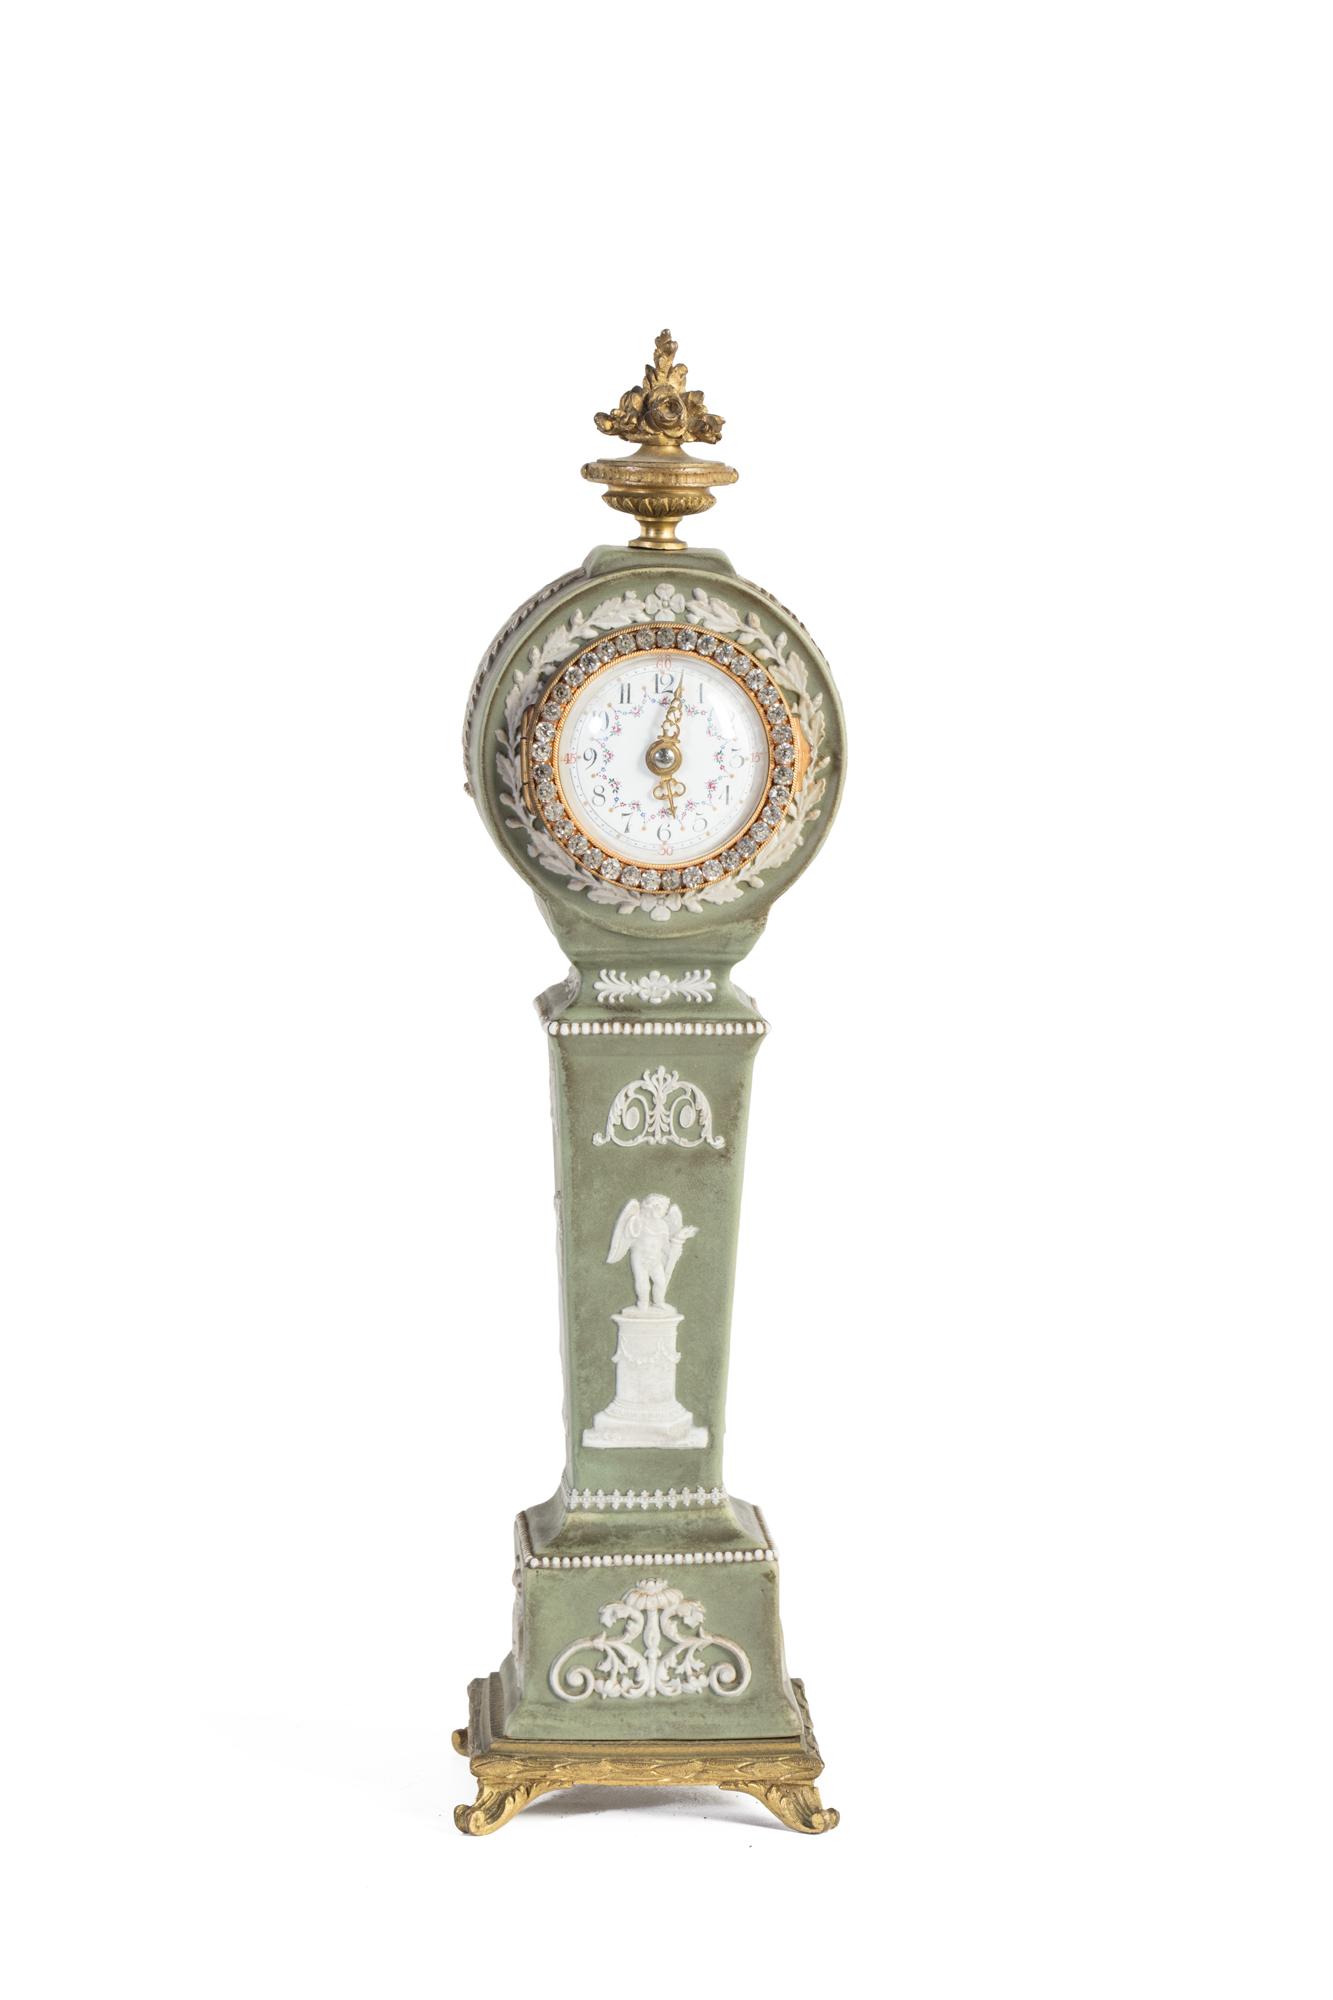 Orologio in porcellana verde e bianca Wedgwood, secoli XIX-XX